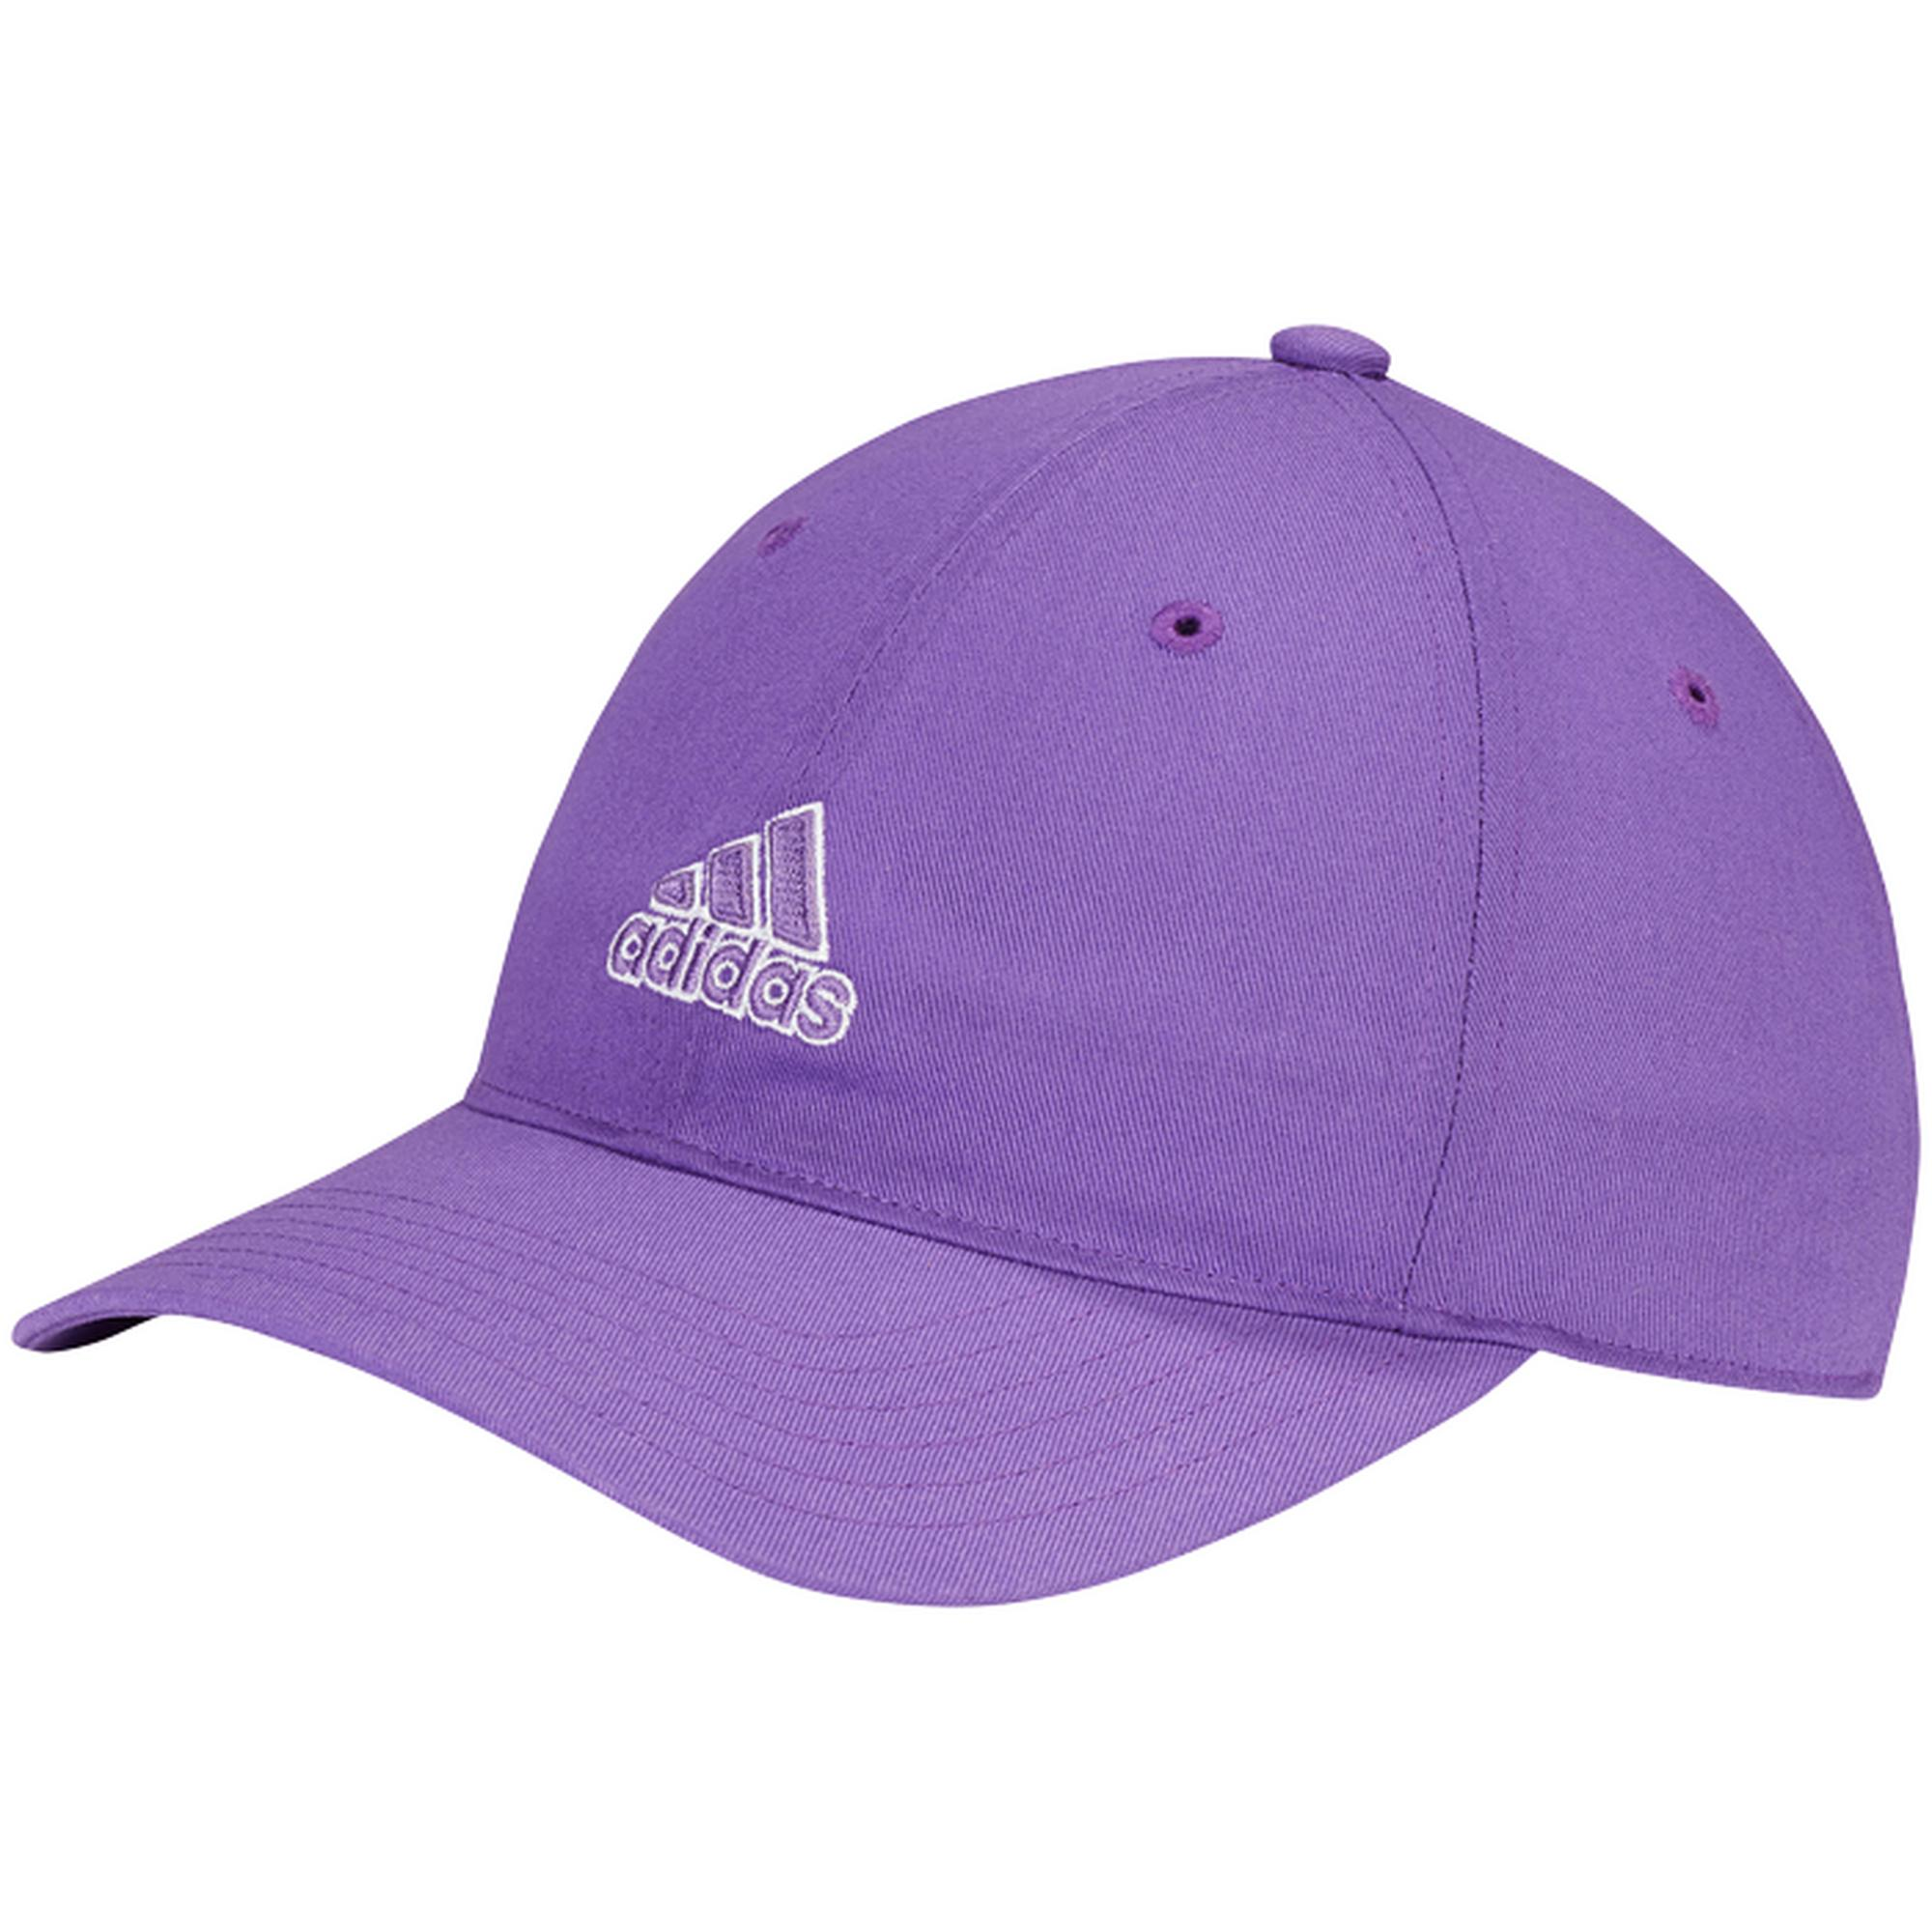 Women's Cotton Logo Cap